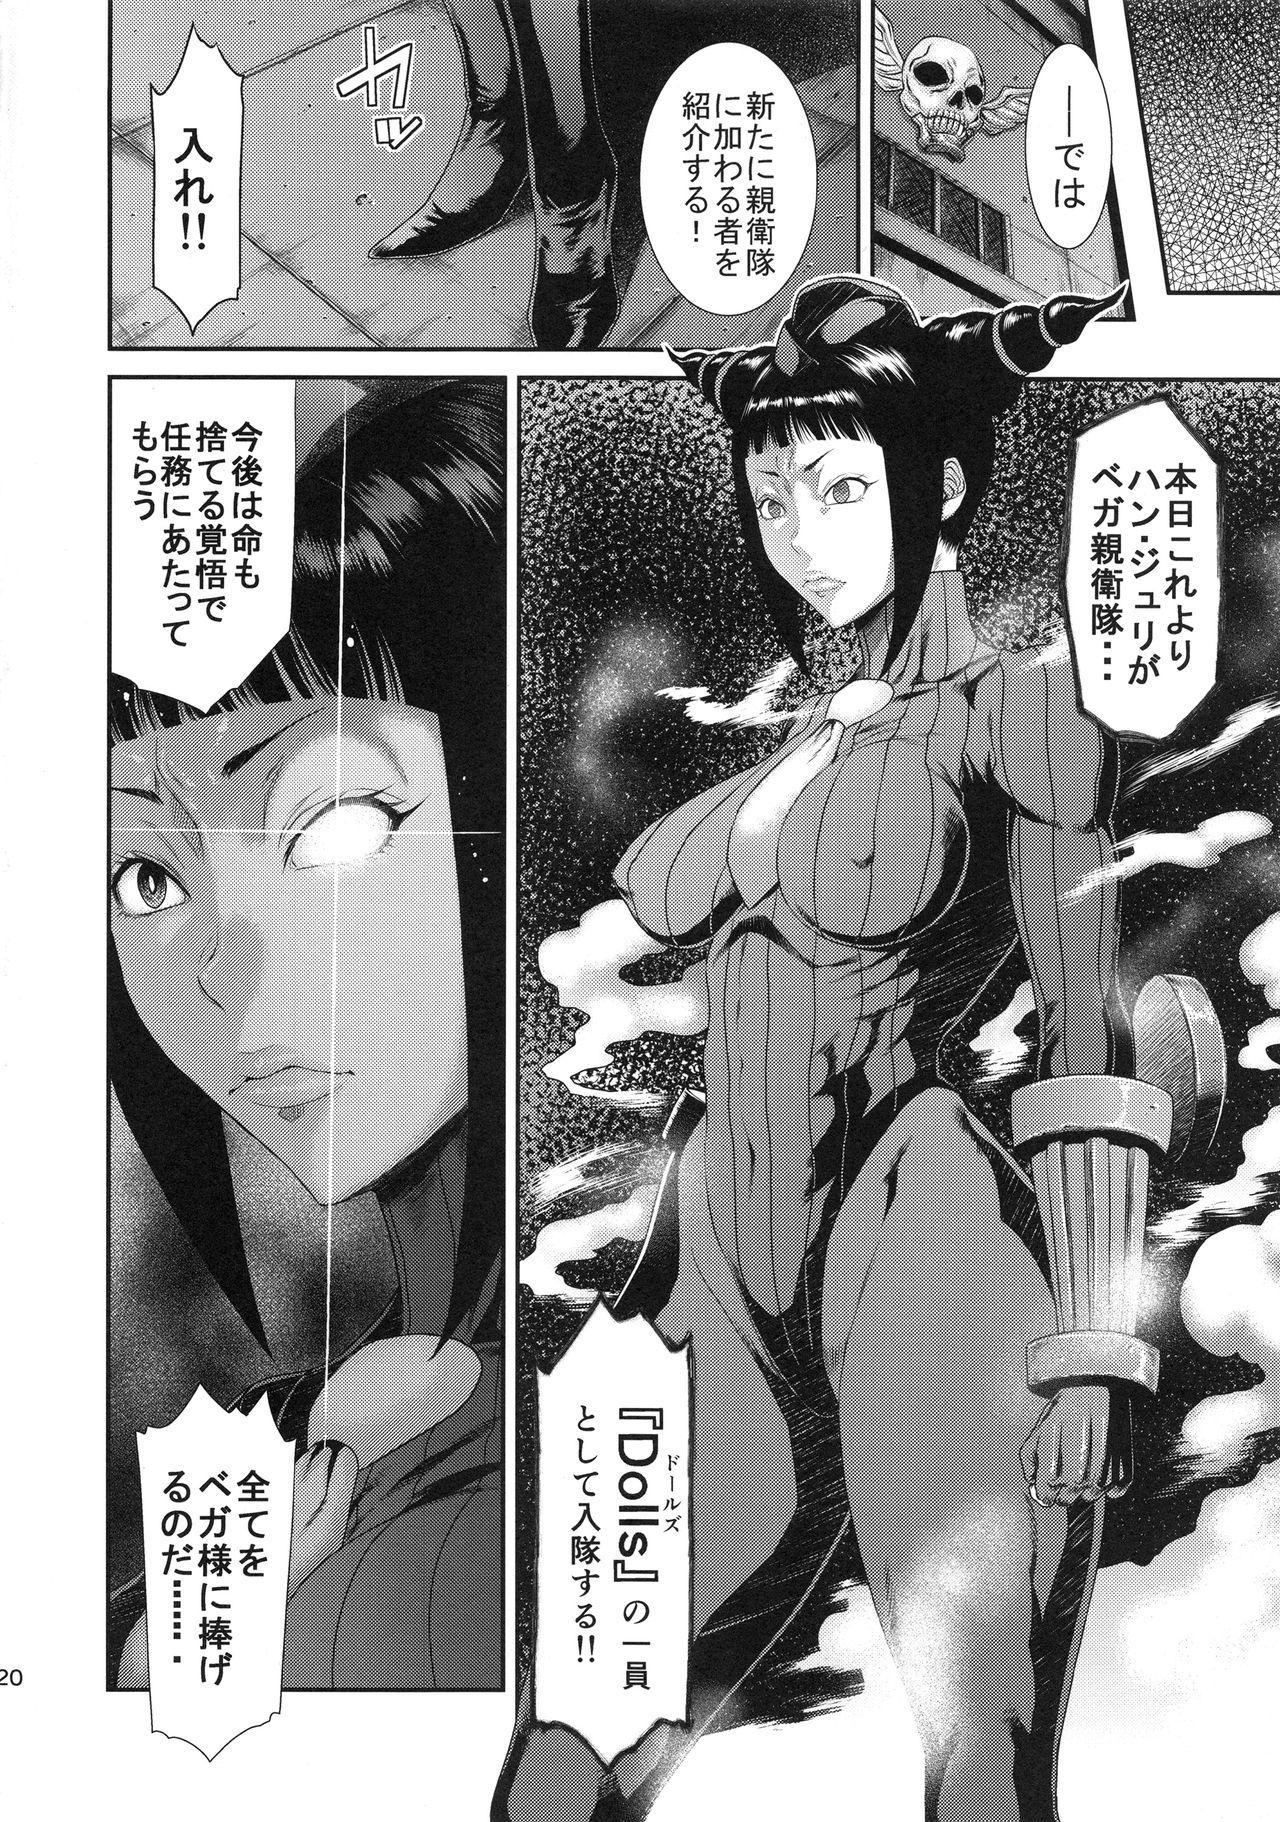 Jaaku - Wicked 18